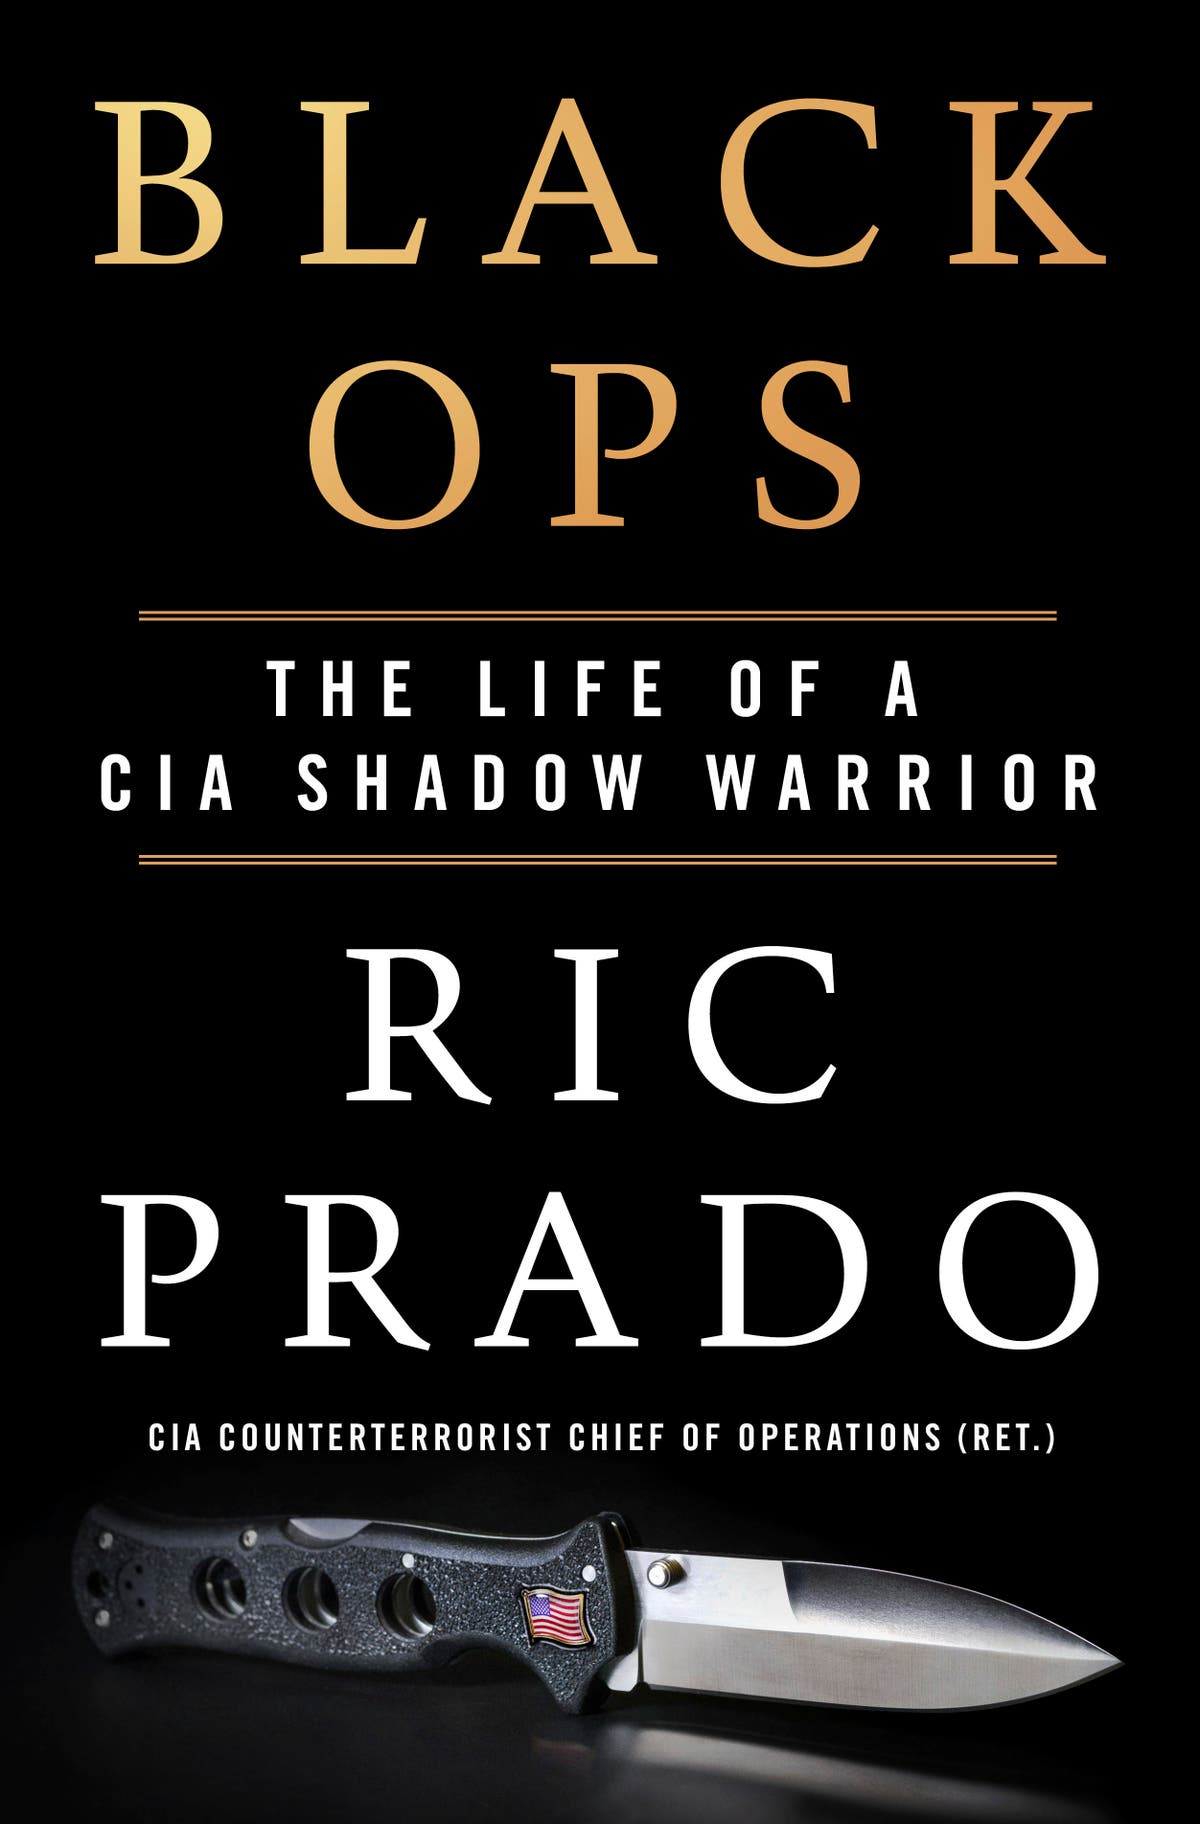 Former CIA operative Enrique 'Ric' Prado writing memoir